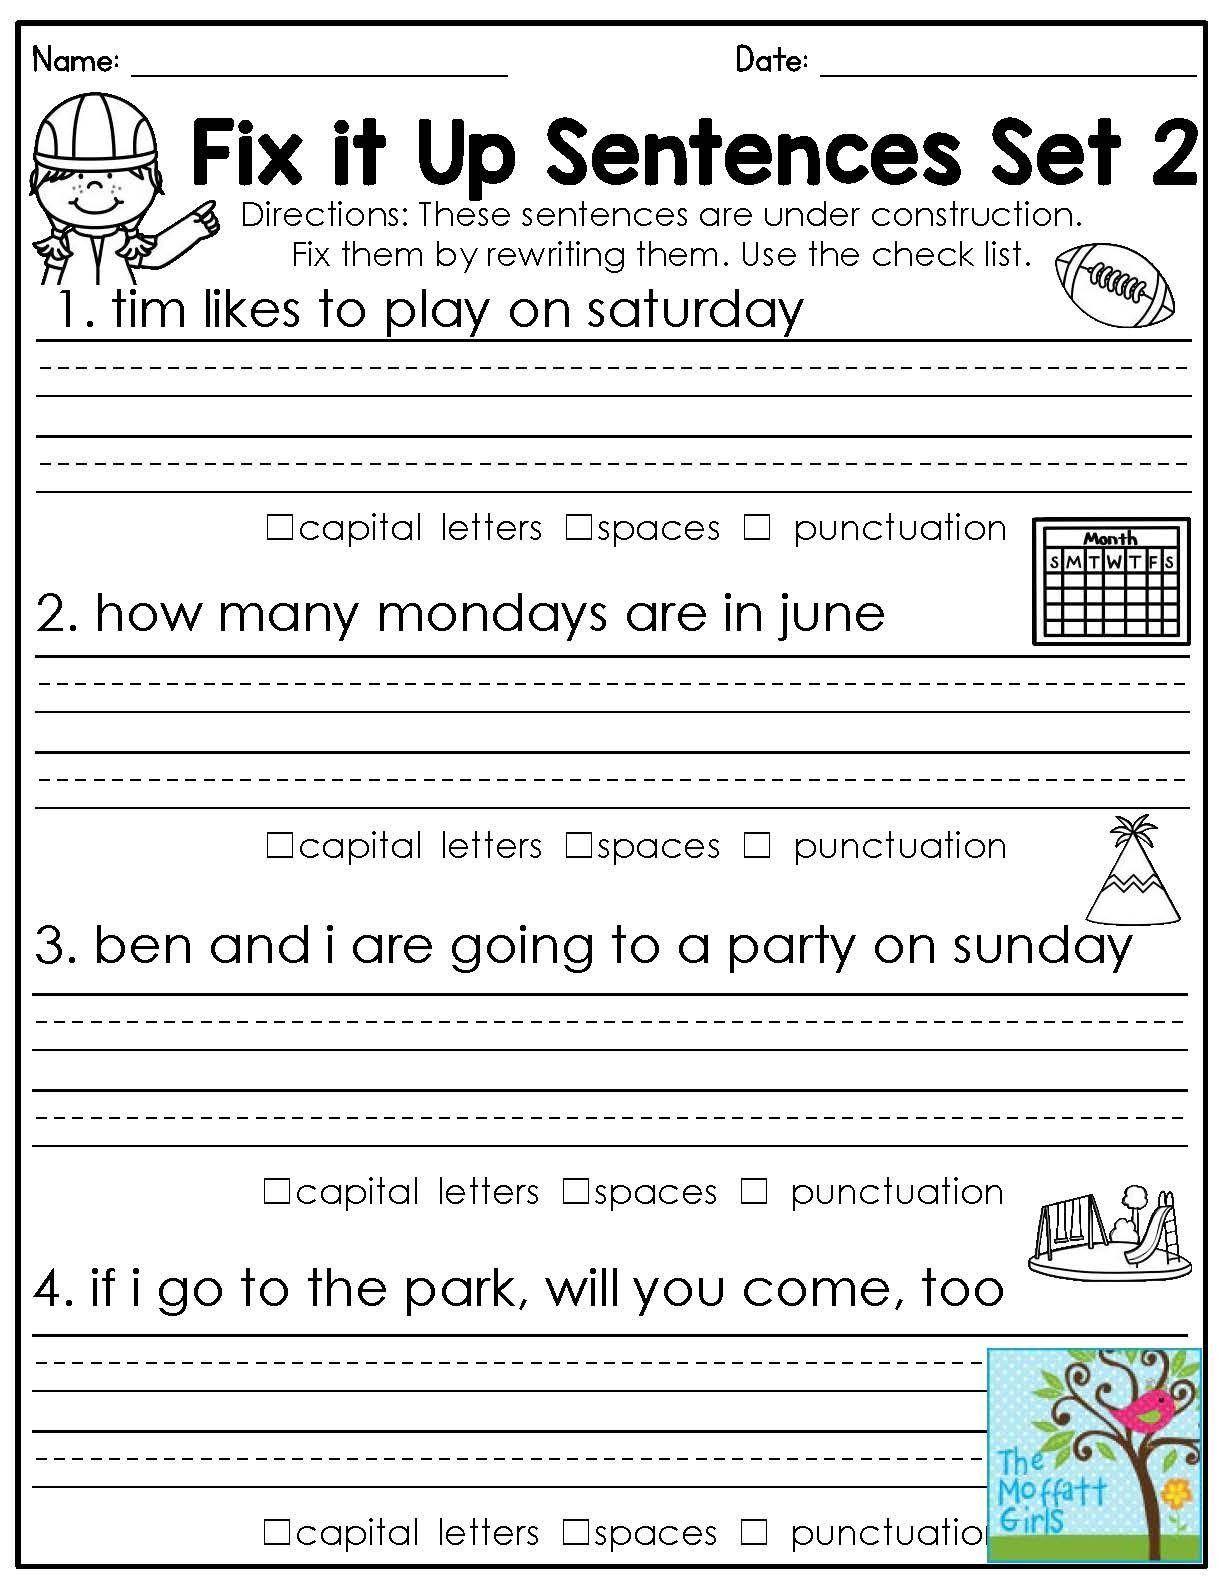 2nd Grade Grammar Worksheet Pin Grammar Proofreading Worksheets 2nd Grade For Grader In 2020 2nd Grade Worksheets Third Grade Grammar Worksheets Punctuation Worksheets